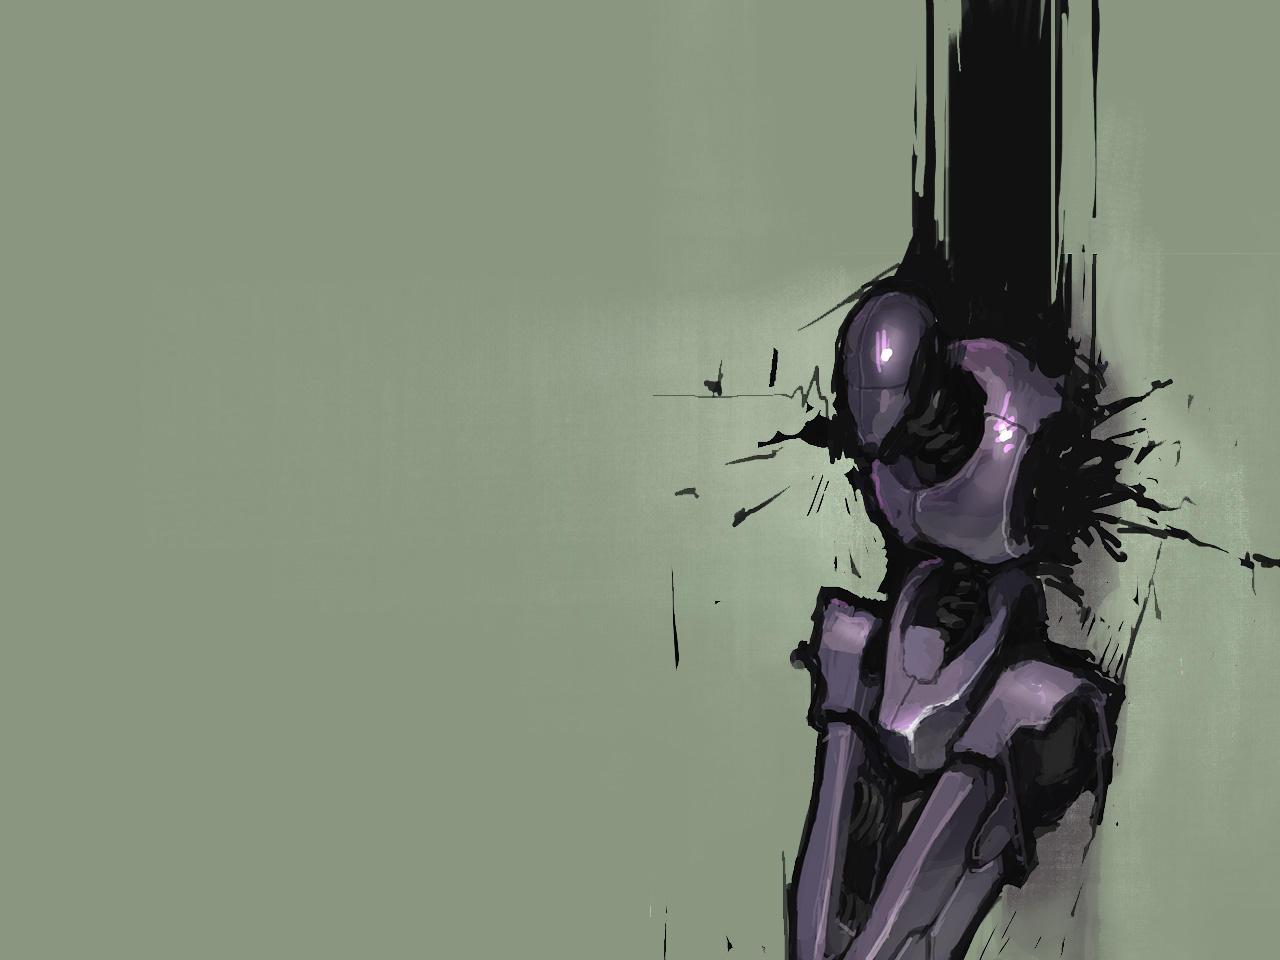 tortured robot wallpaper by spx